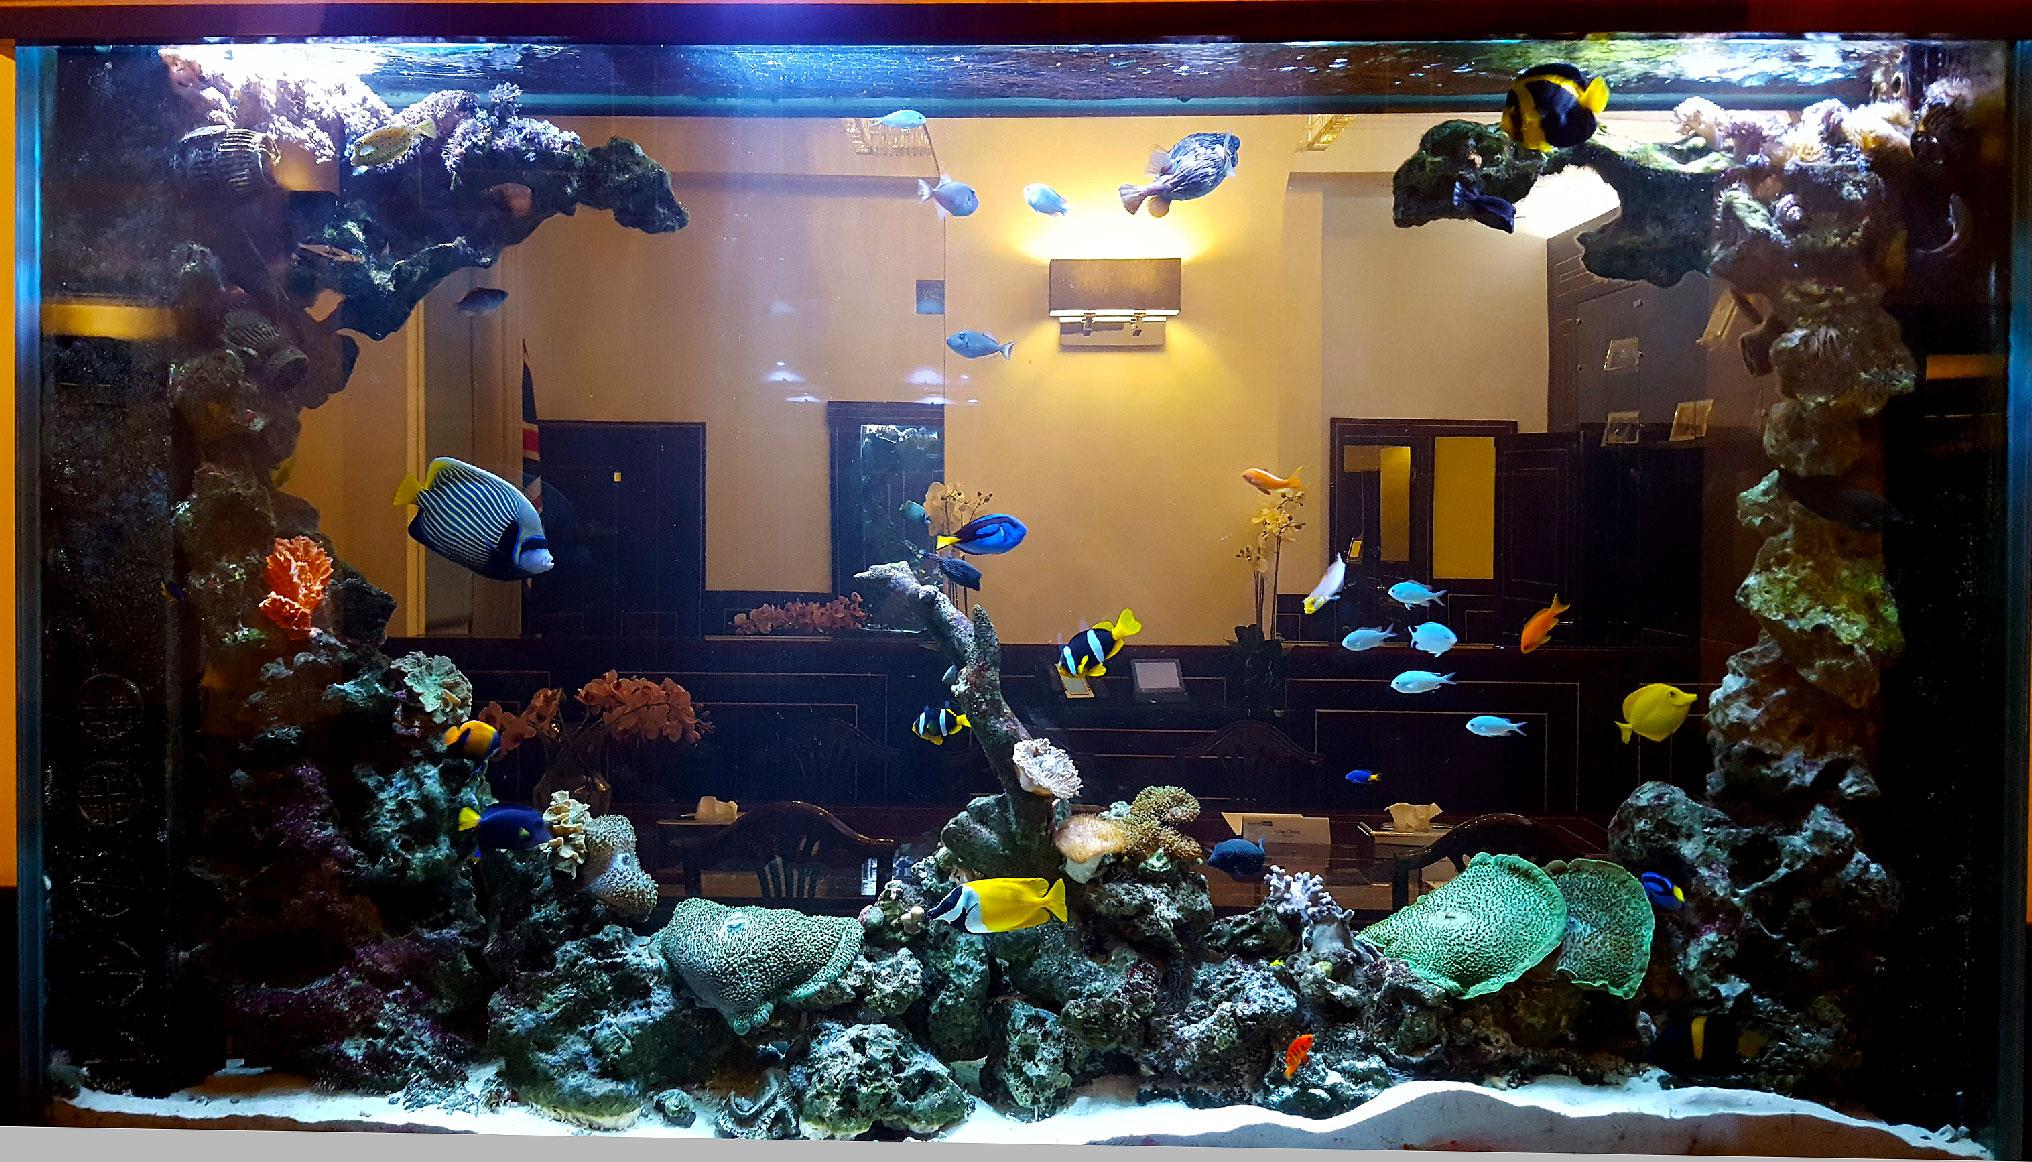 Wall Aquarium Feature